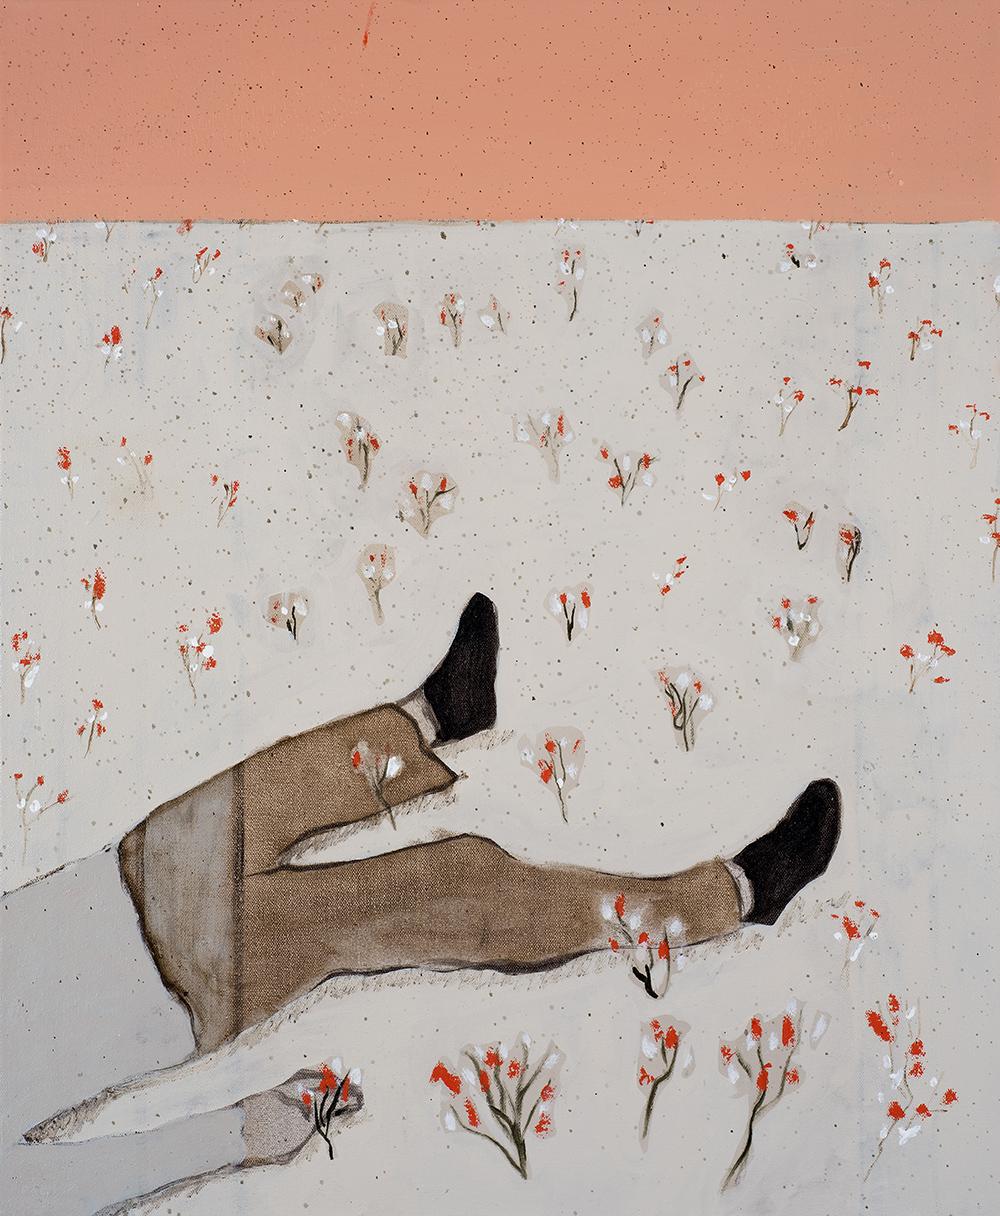 Francisco Rodriguez.<em> Garden with men</em>, 2019. Oil on canvas, 23 5/8 x 19 5/8 inches (60 x 50 cm)